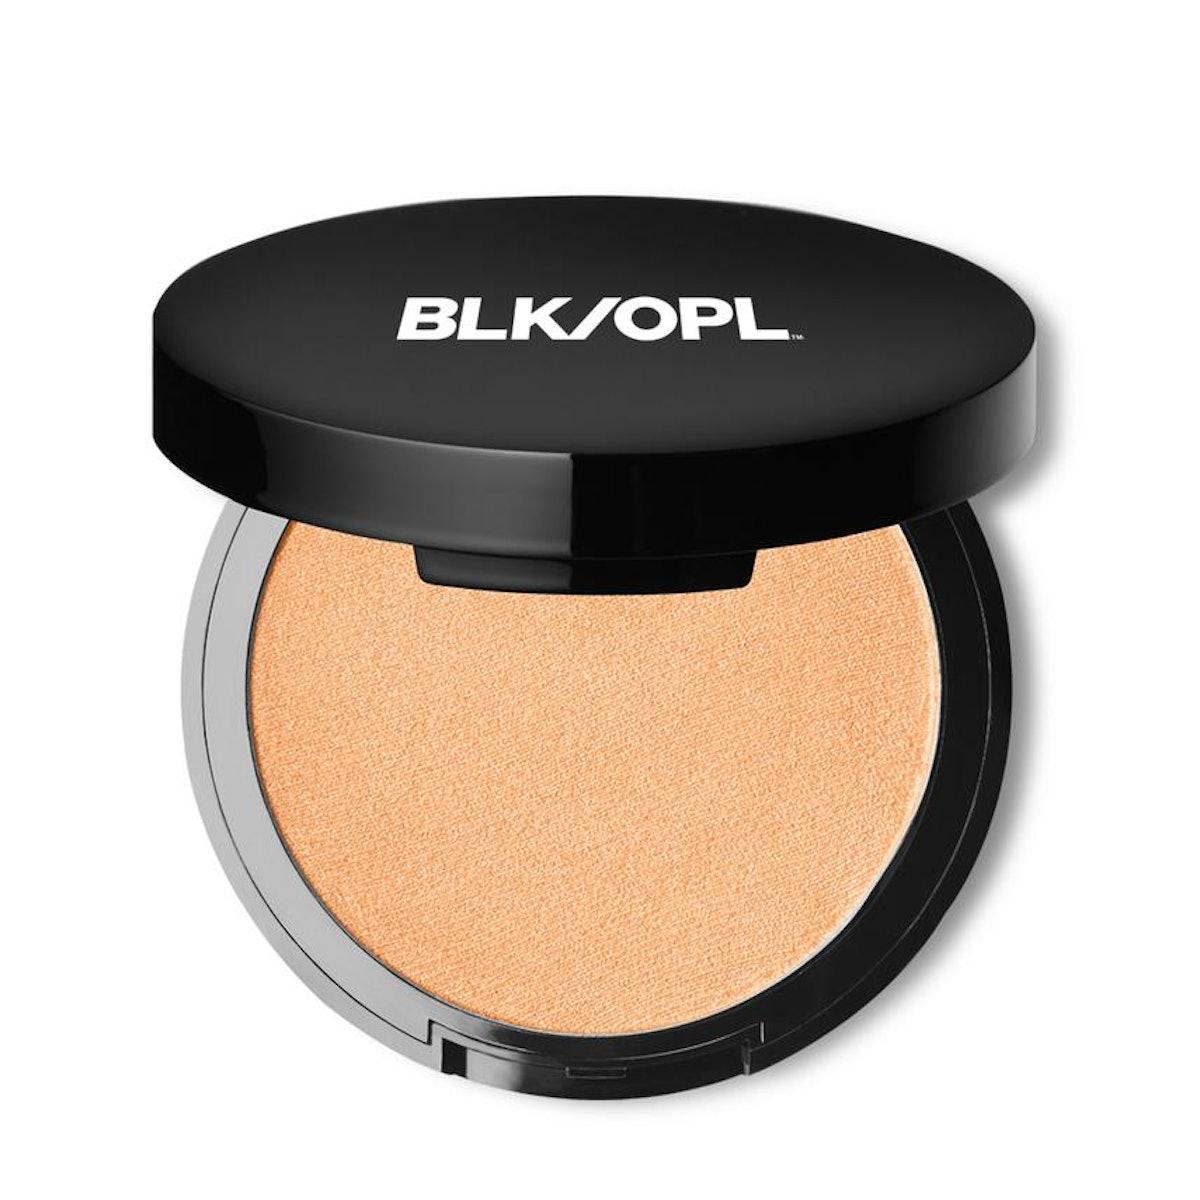 BLK/OPL TRUE COLOR Illuminating Powder